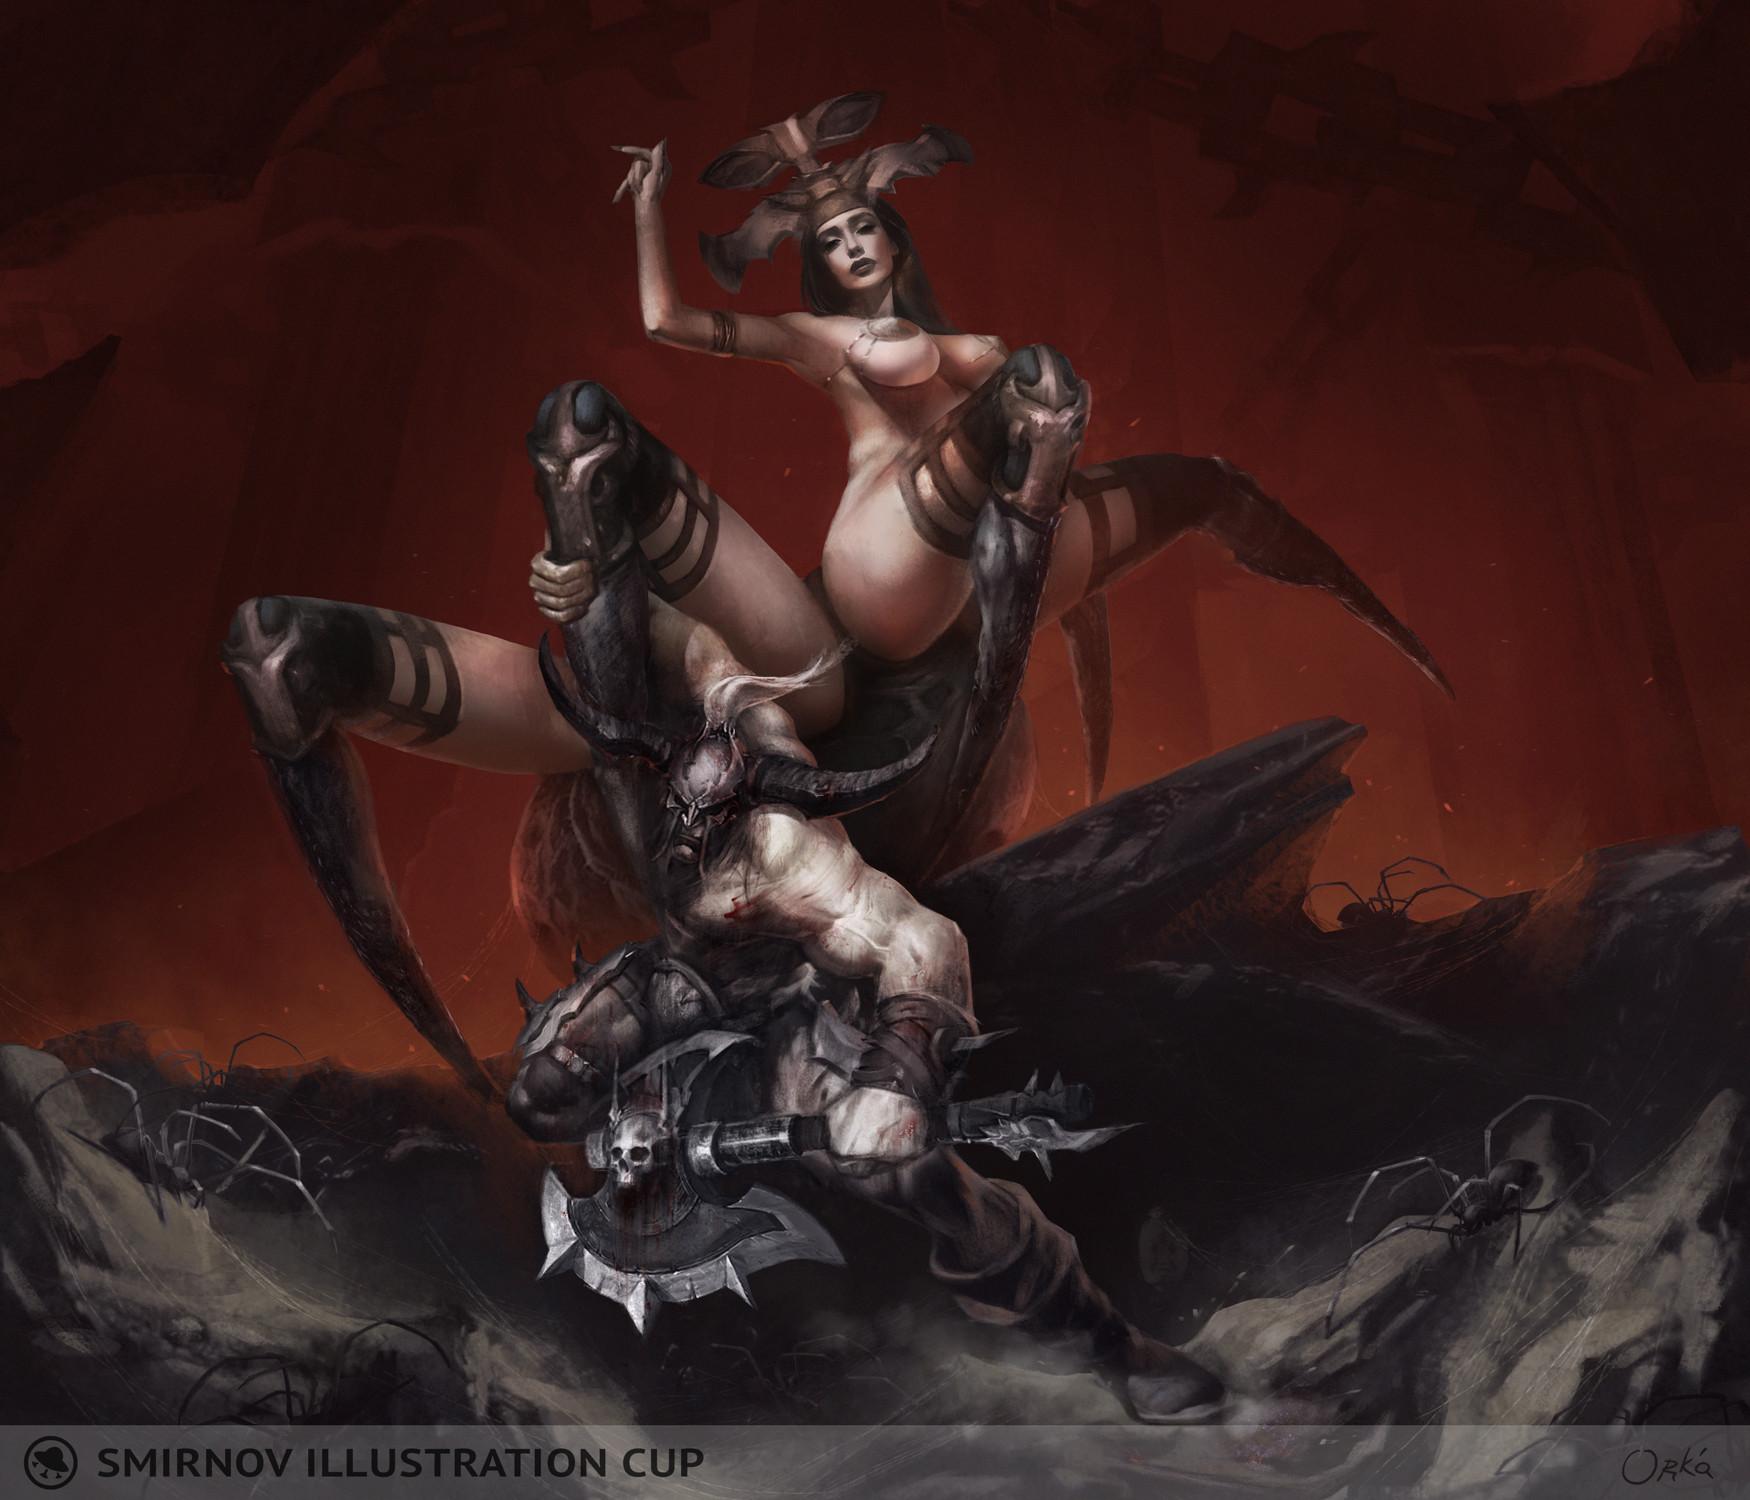 dmitry-ork-cydaea-and-barbarian-small.jpg